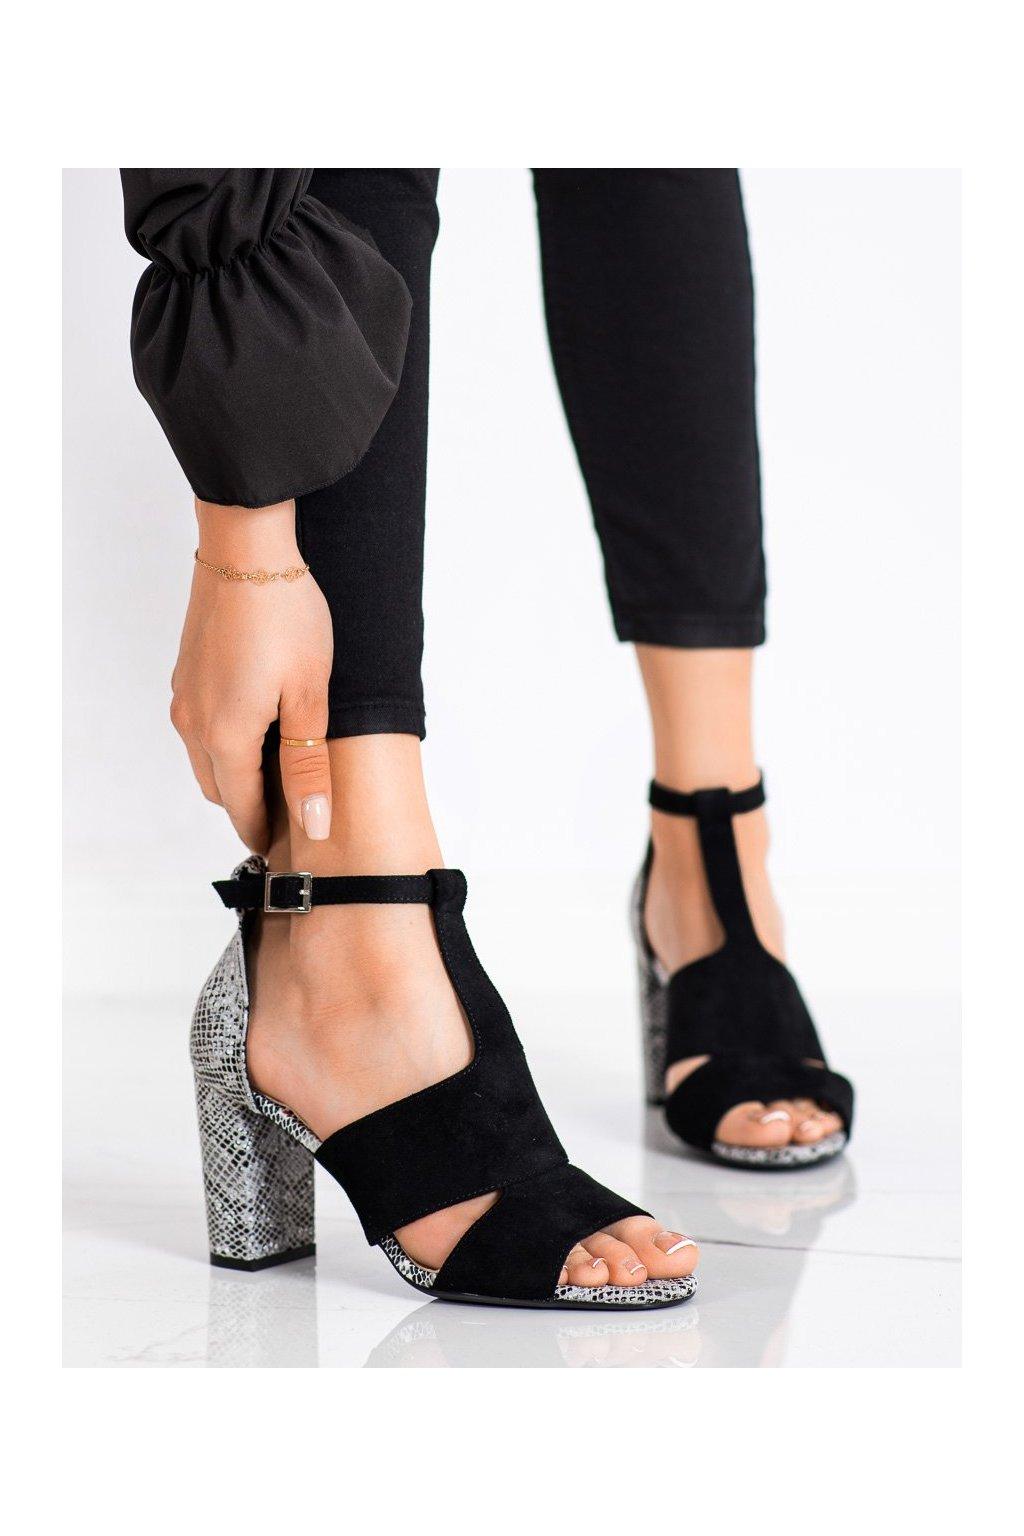 Čierne sandále na podpätku Sergio leone kod SK905B/SNA